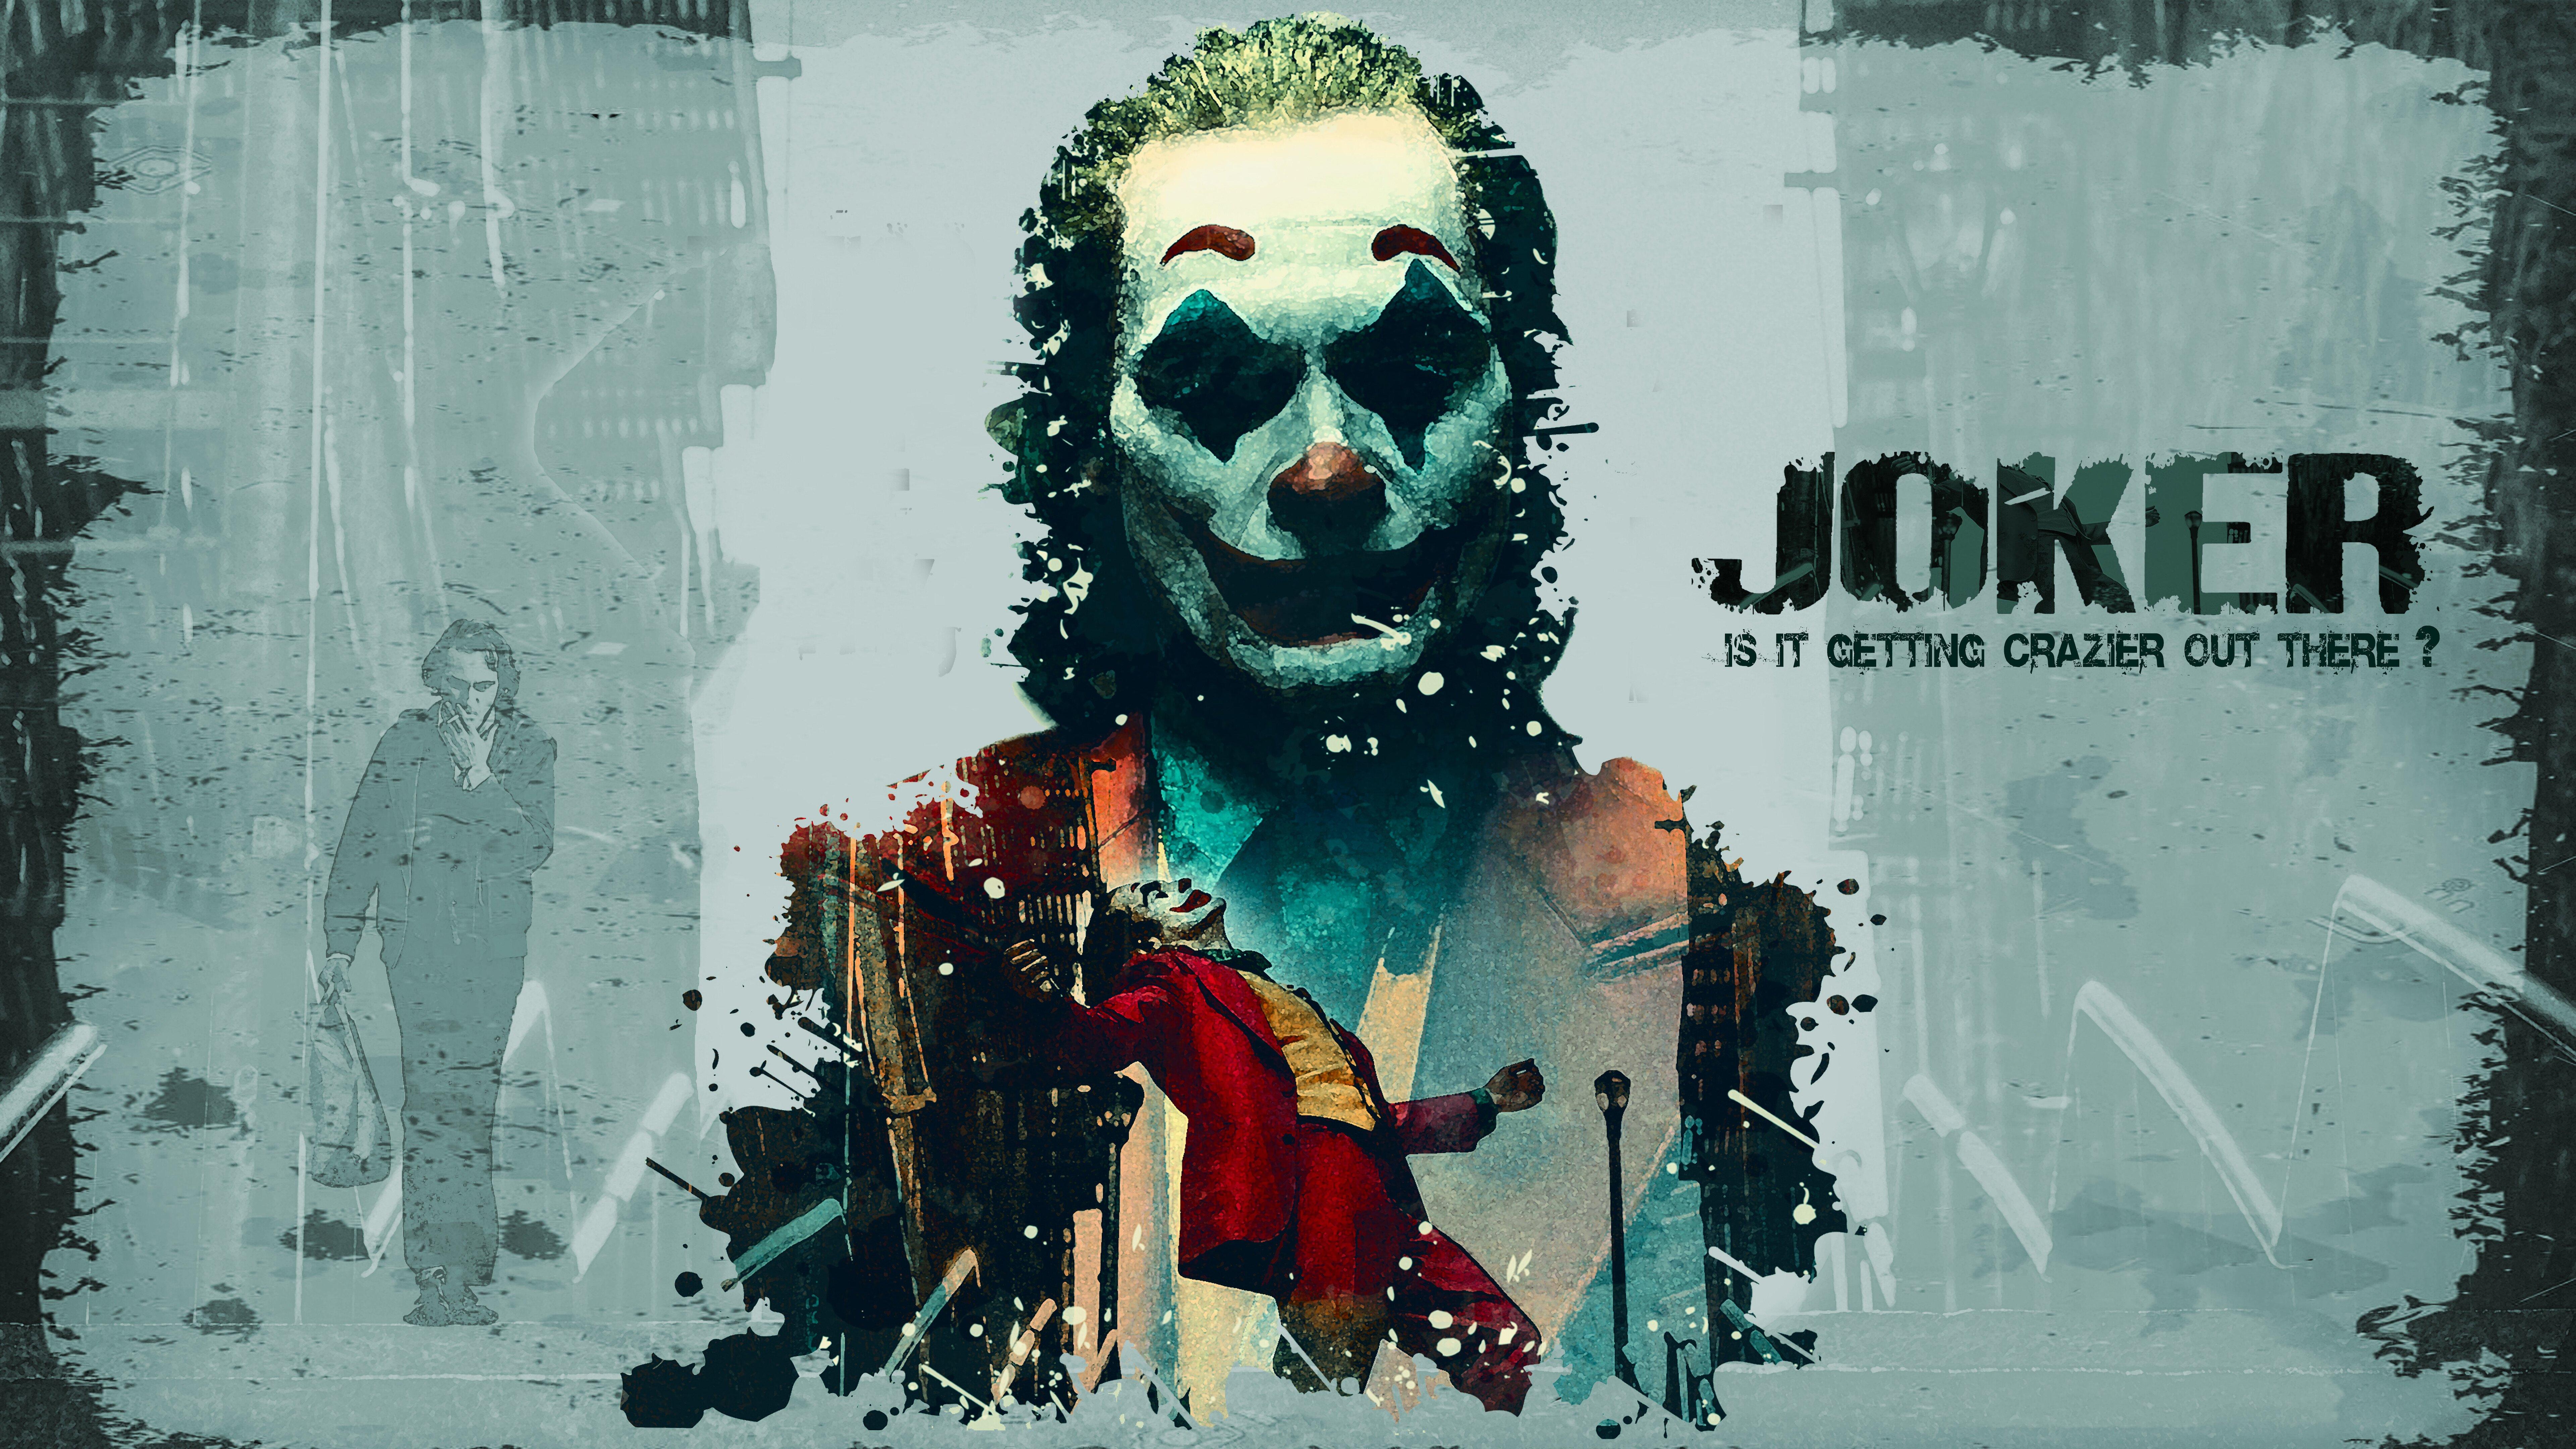 Joker Movie With Joaquin Phoenix Wallpaper 8k Ultra Hd Id 3807